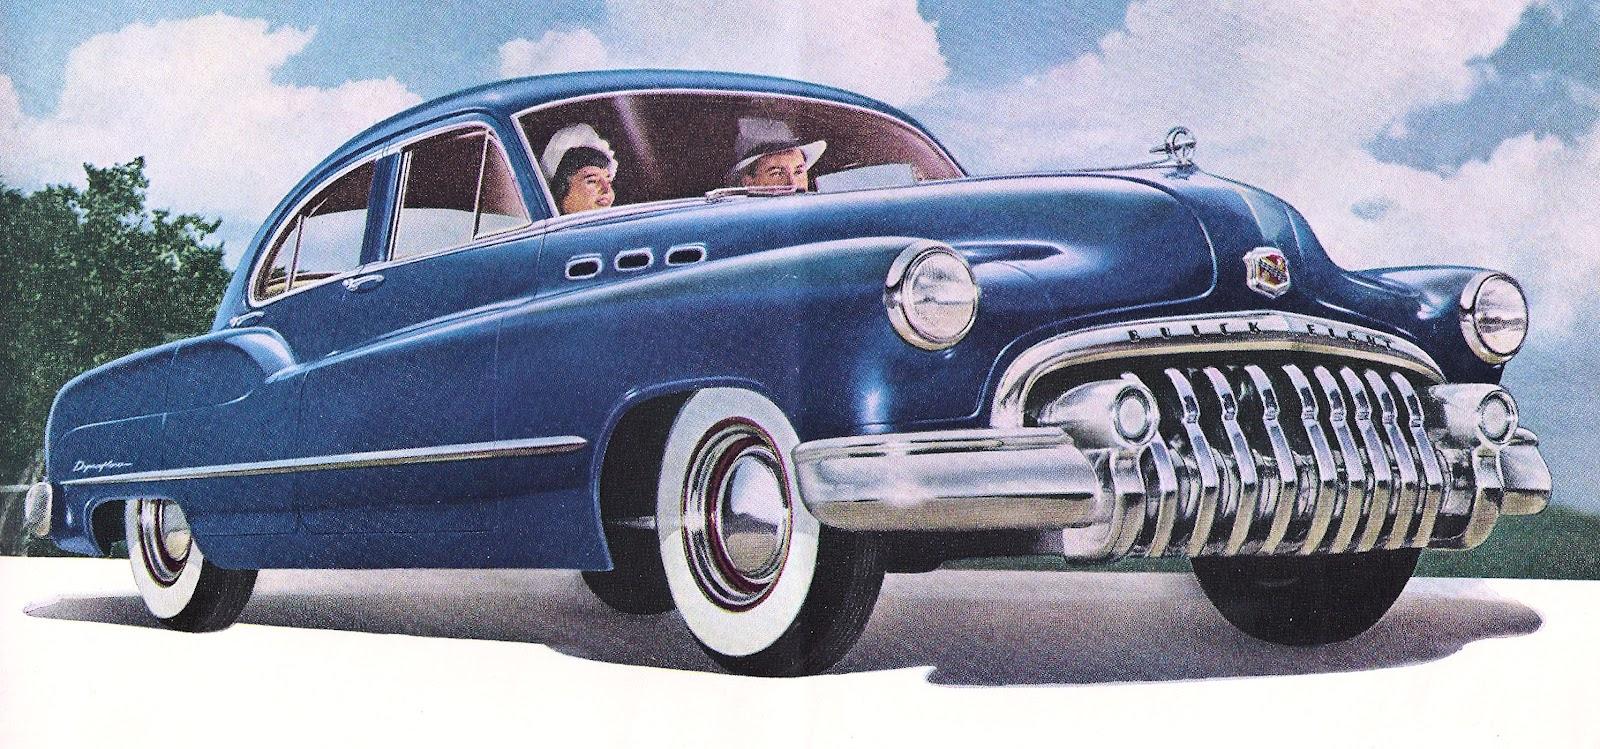 1950buickblue